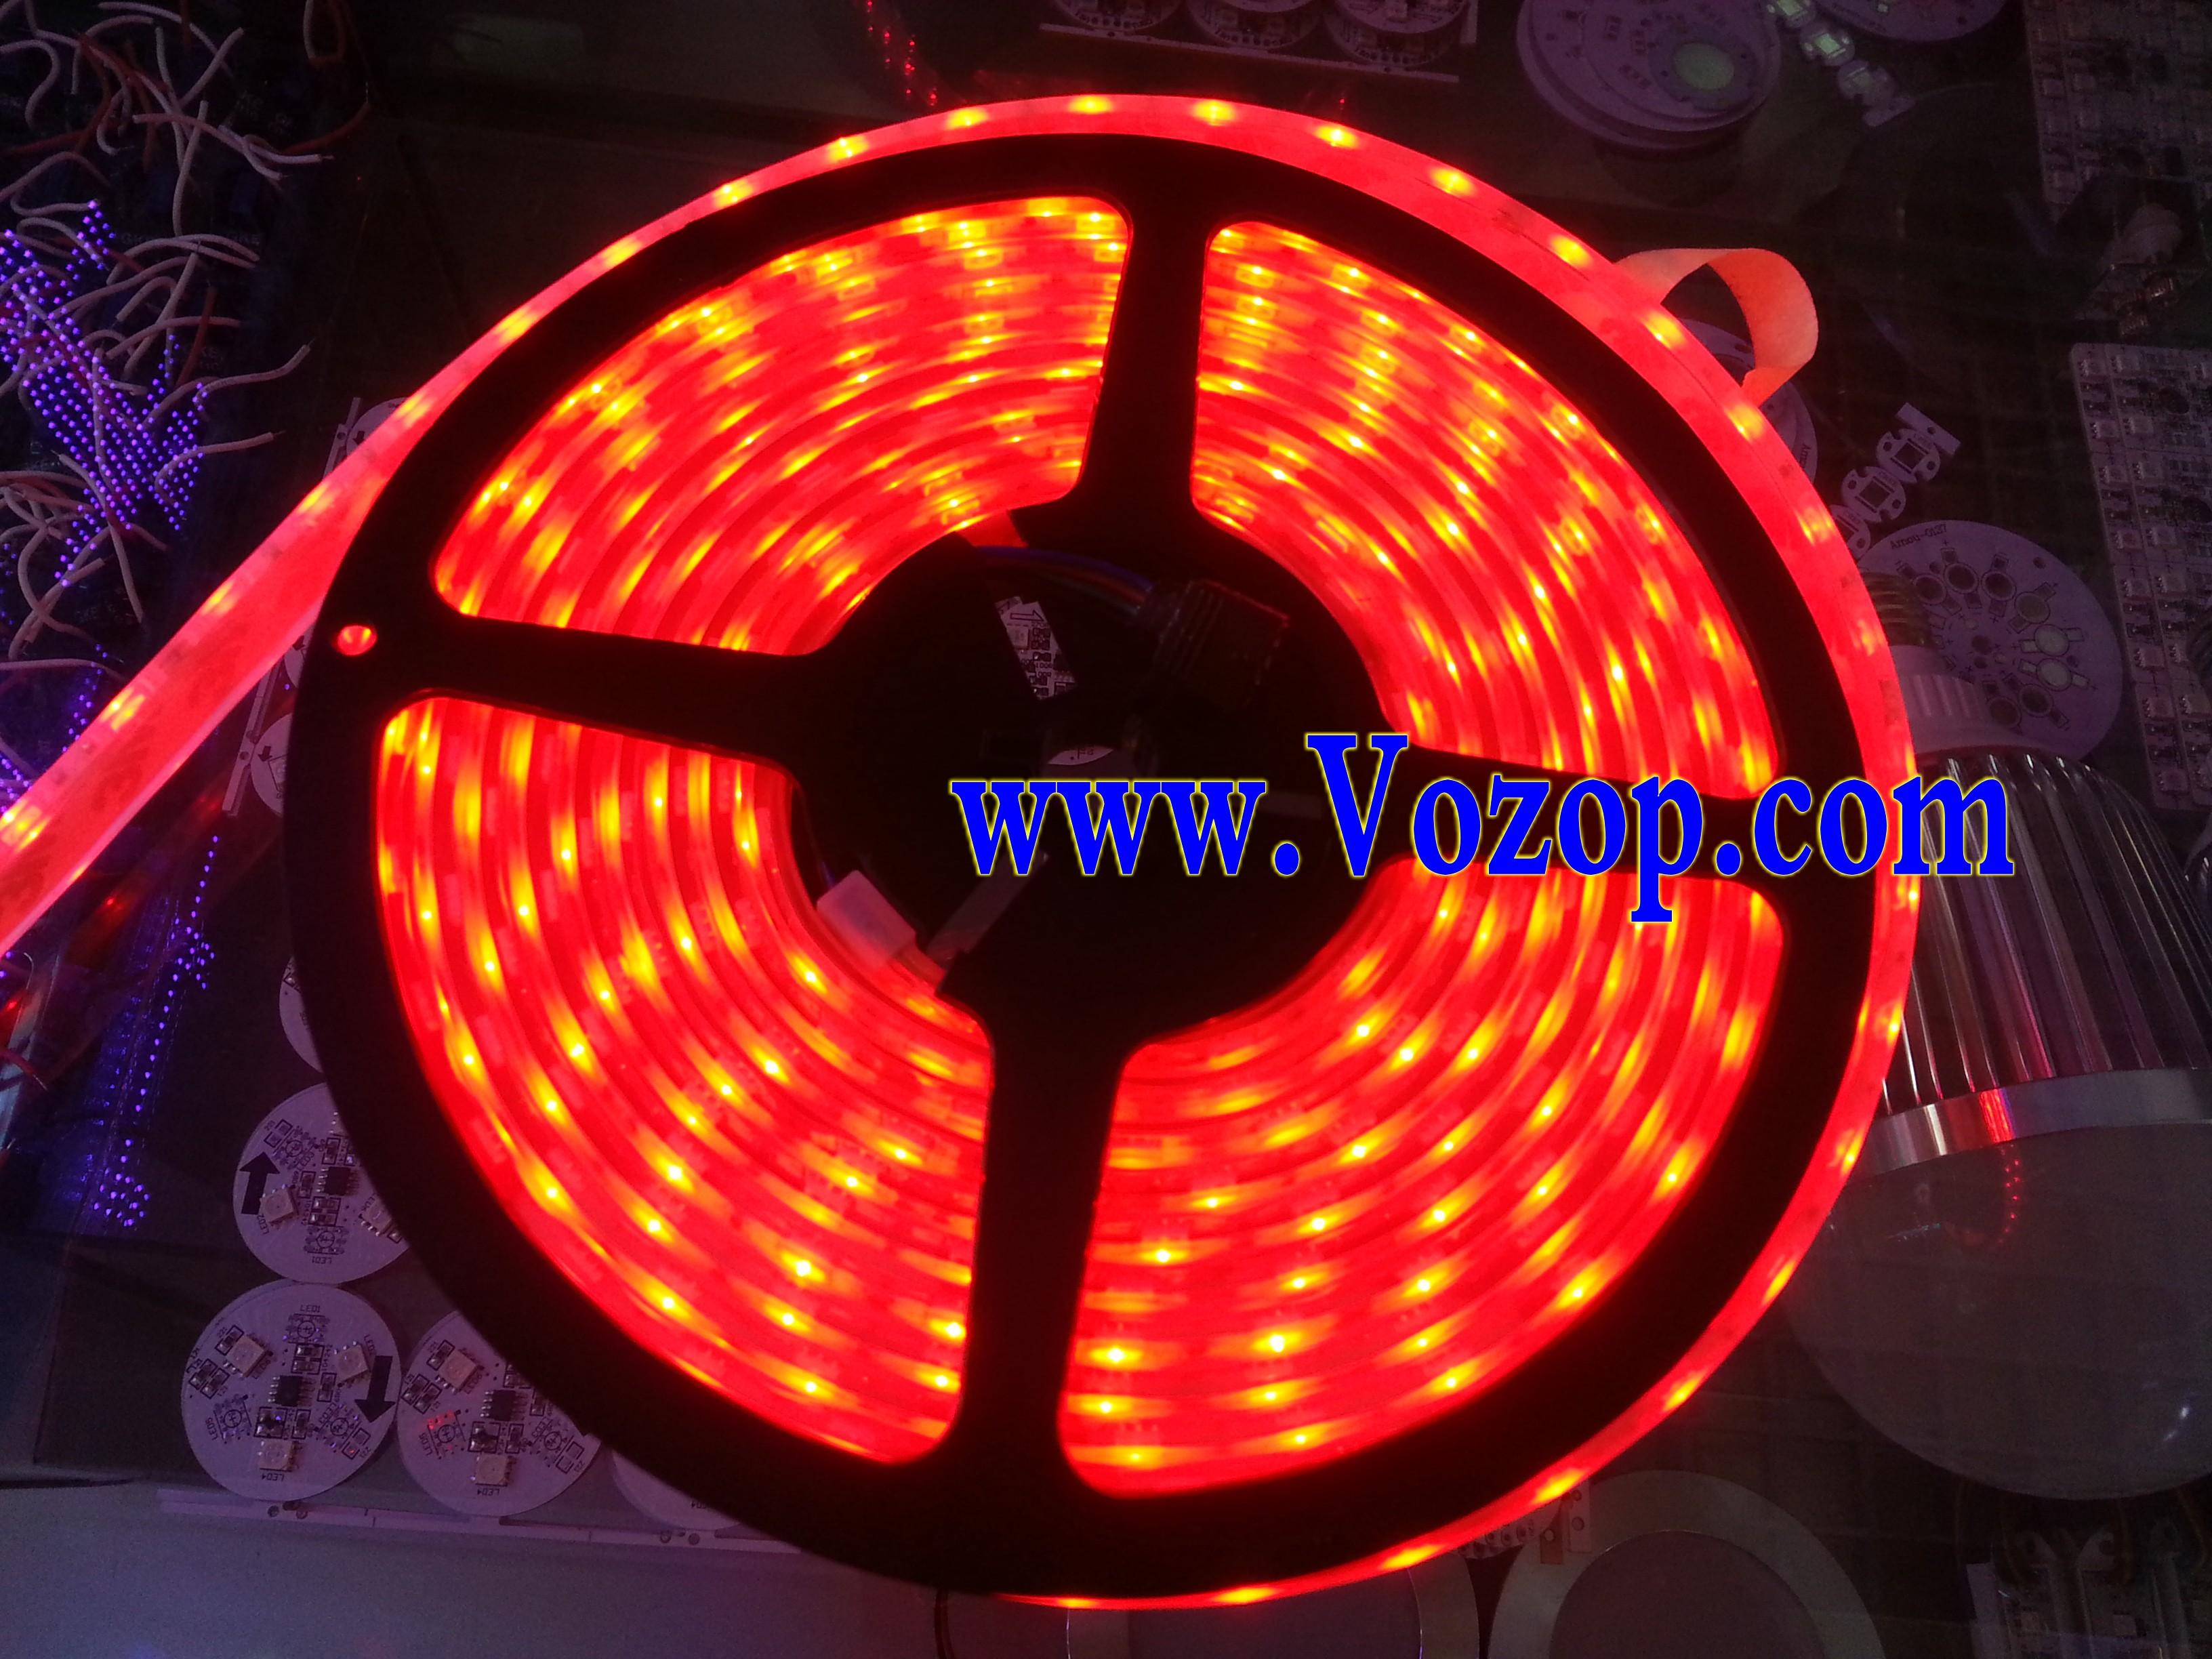 16.4_Ft_IP68_waterproof_RGB_LED_tape_Strip_lights